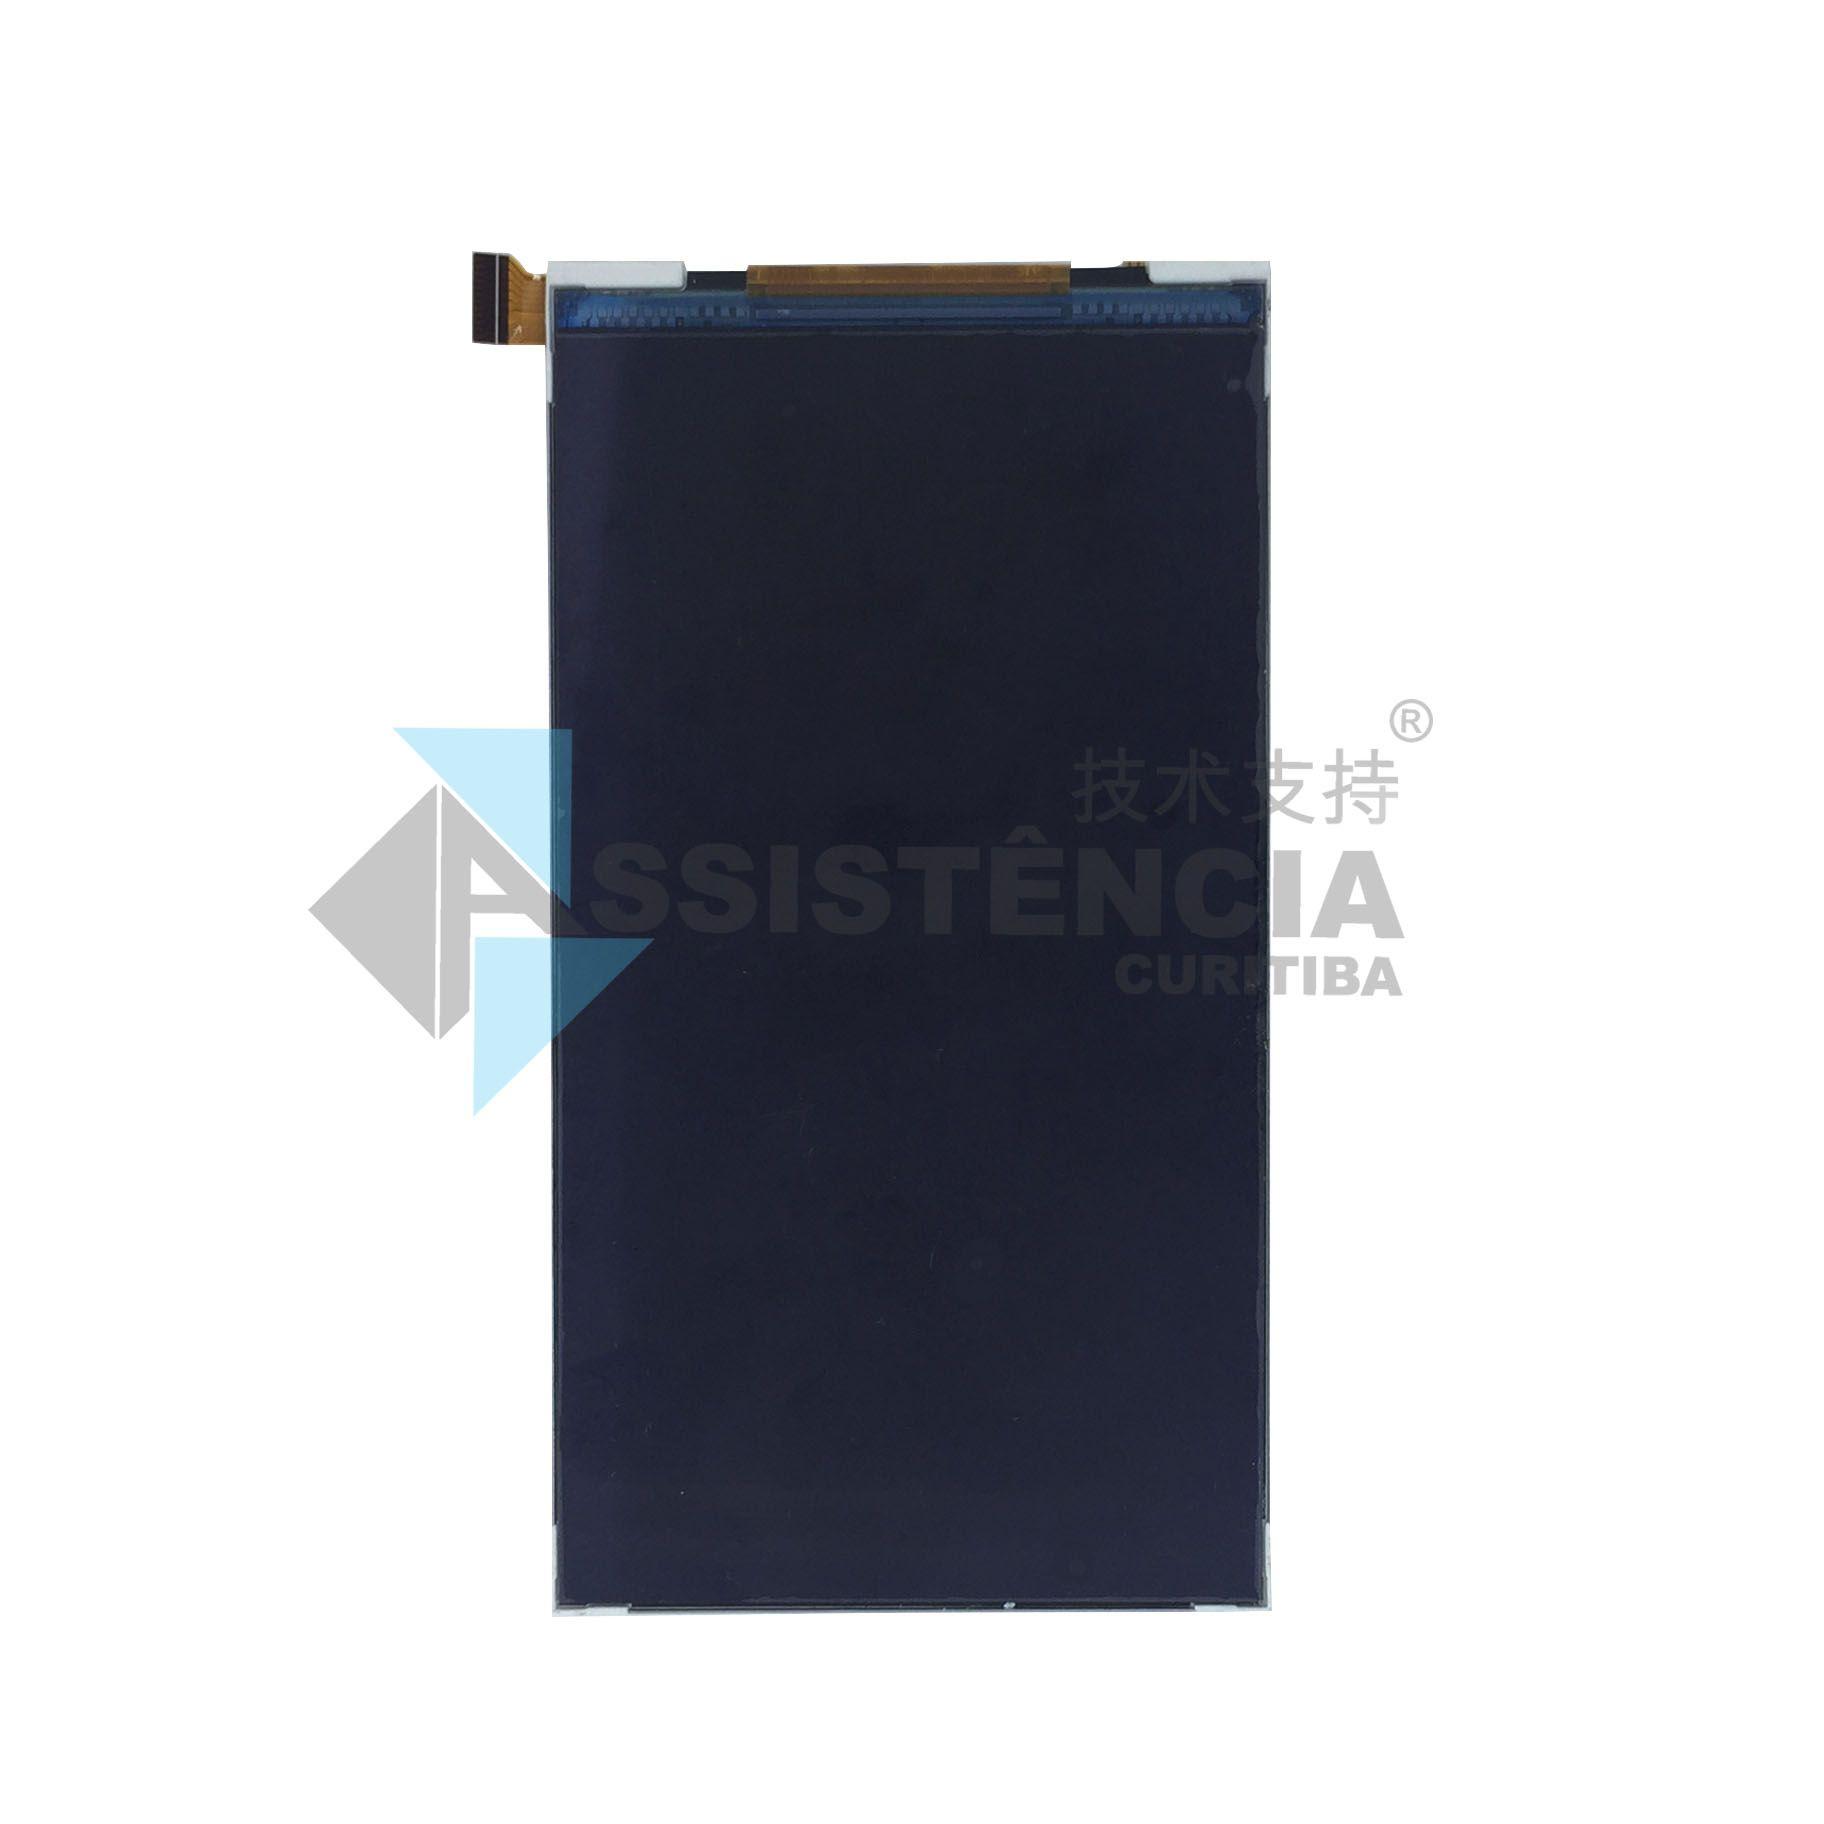 TELA DISPLAY LCD CELULAR BLU GRAND HD G010